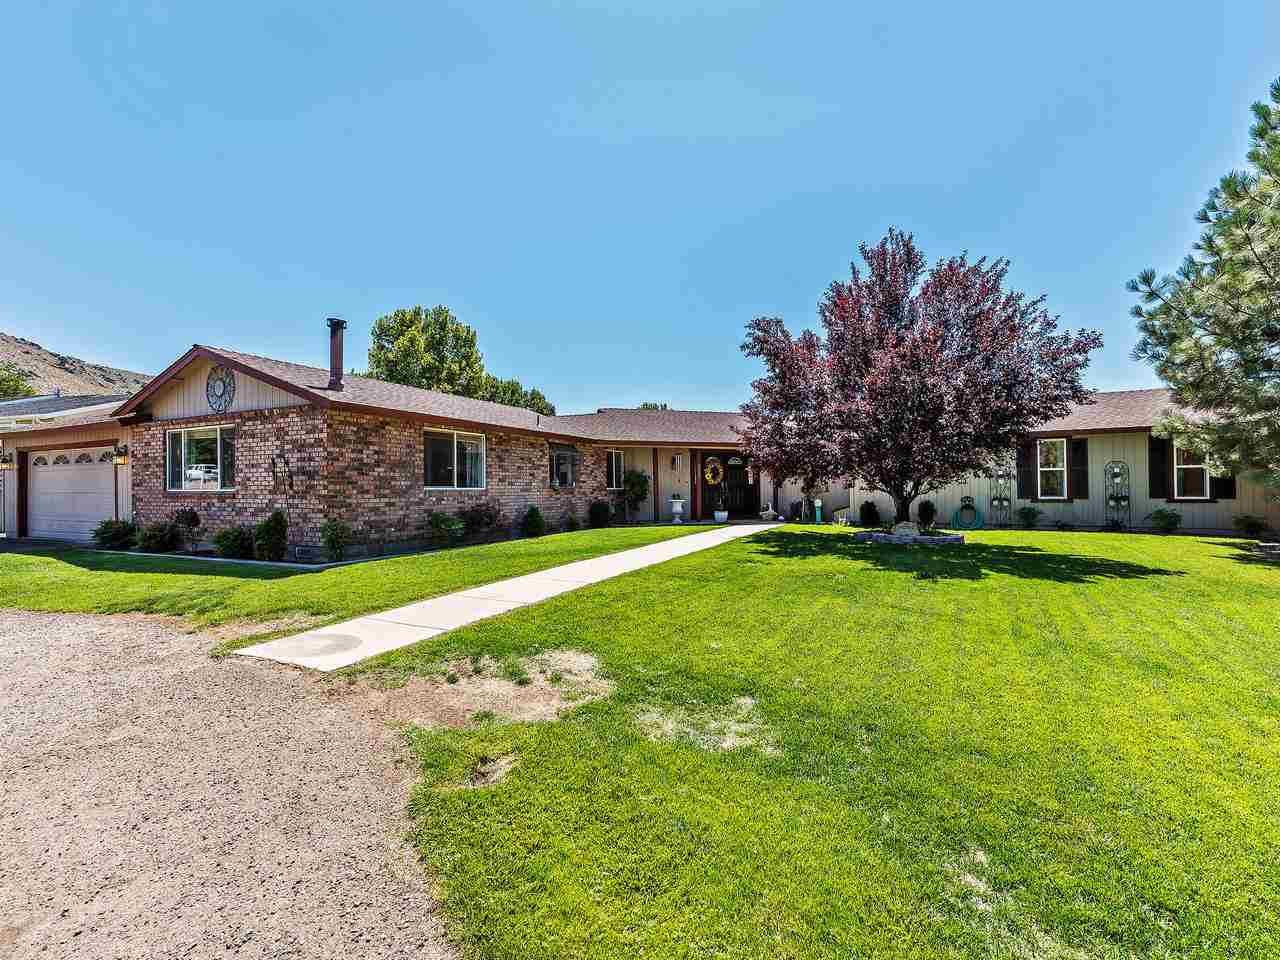 2009 De Ann Drive, Carson City, NV 89701 now has a new price of $465,000!